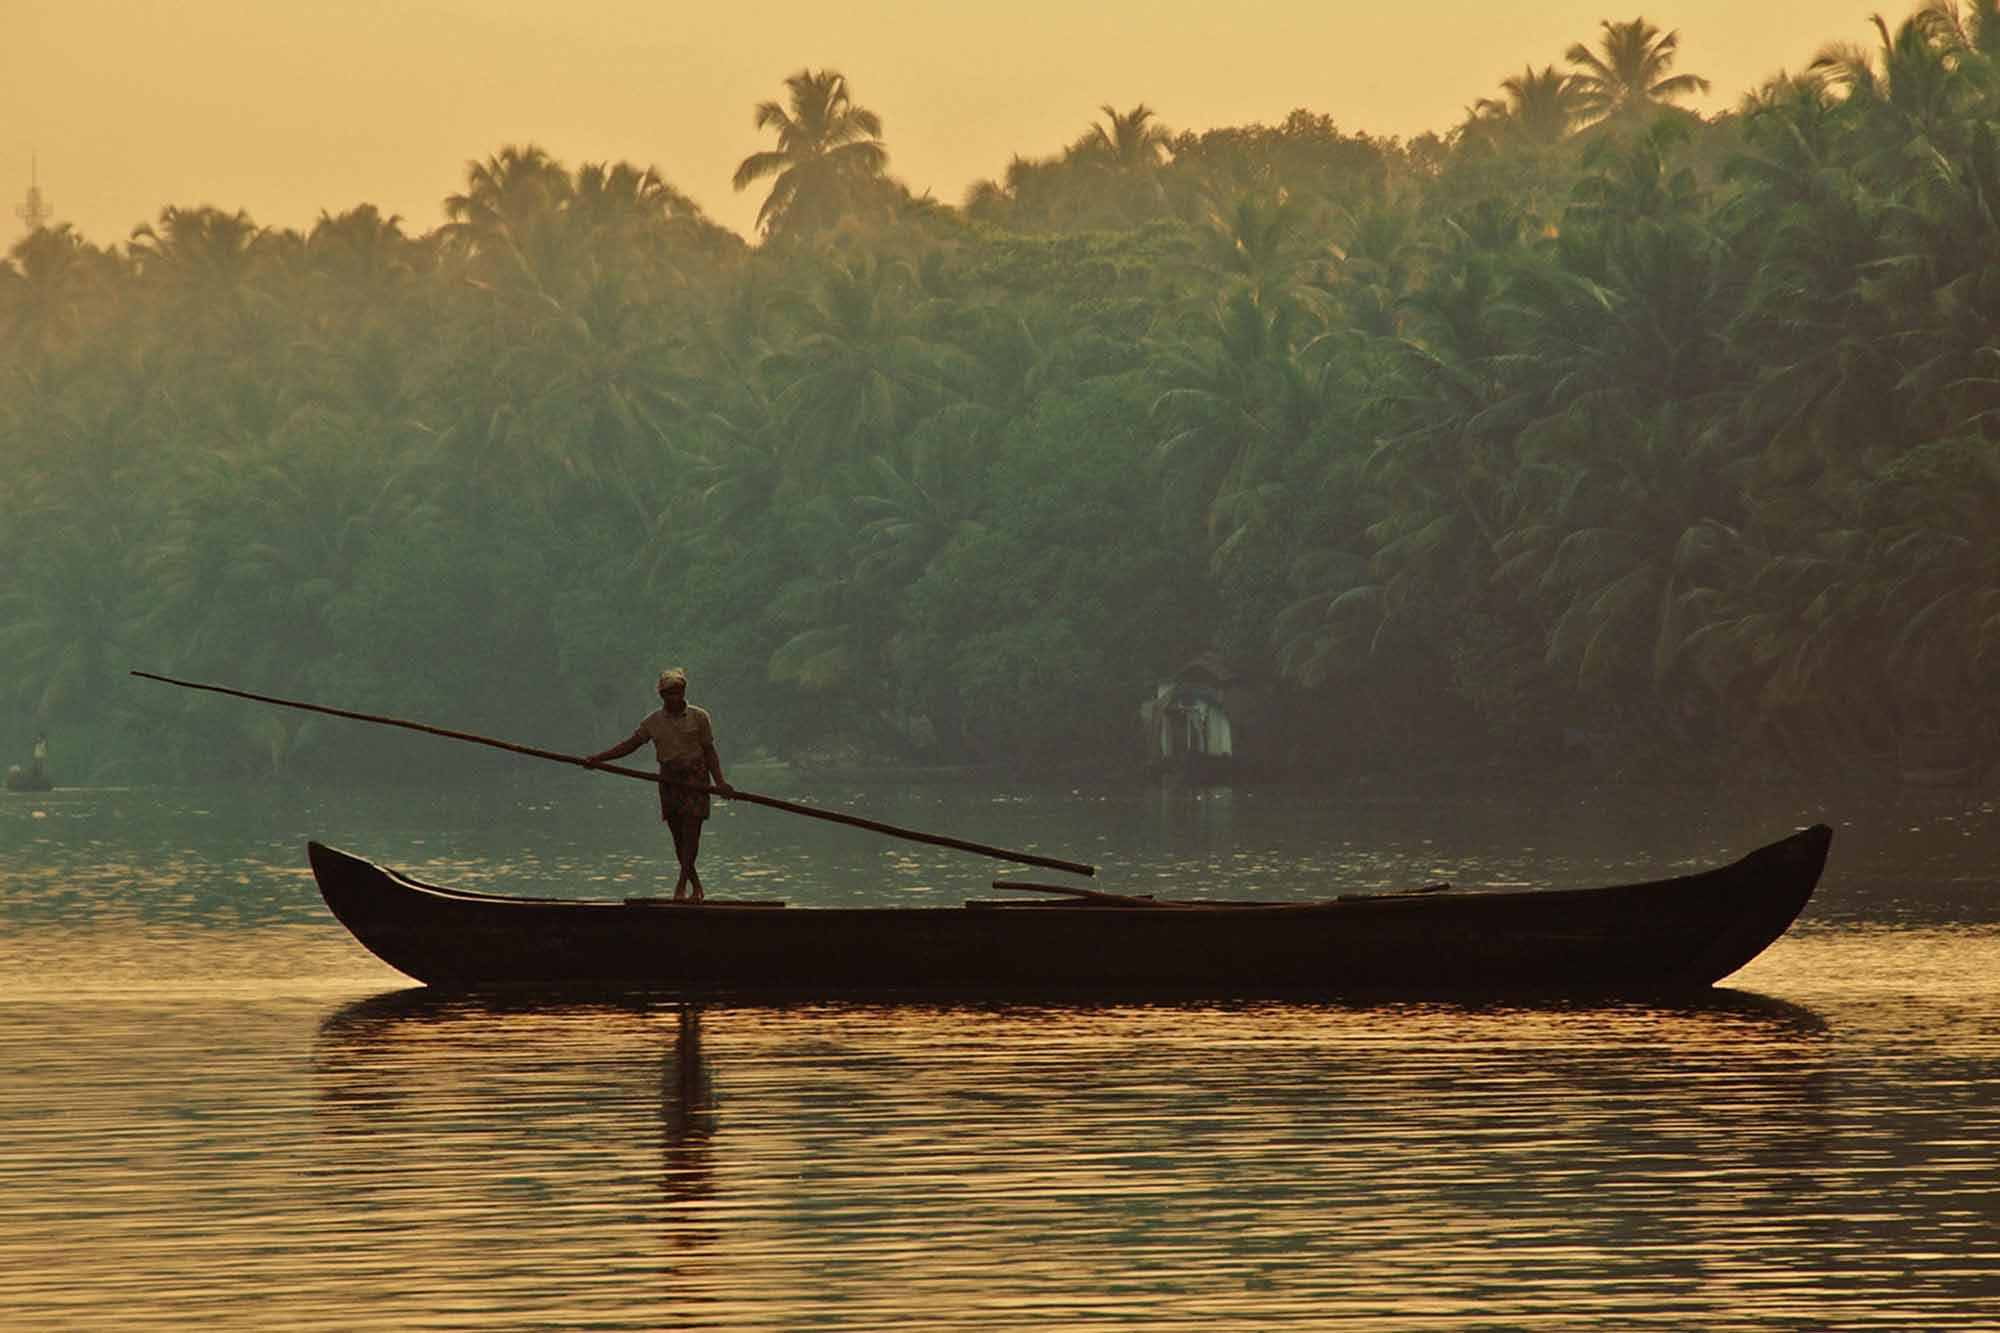 https://www.soulandsurf.com/wp-content/uploads/2021/09/Retreatsindia-images-India-backwaters.jpg